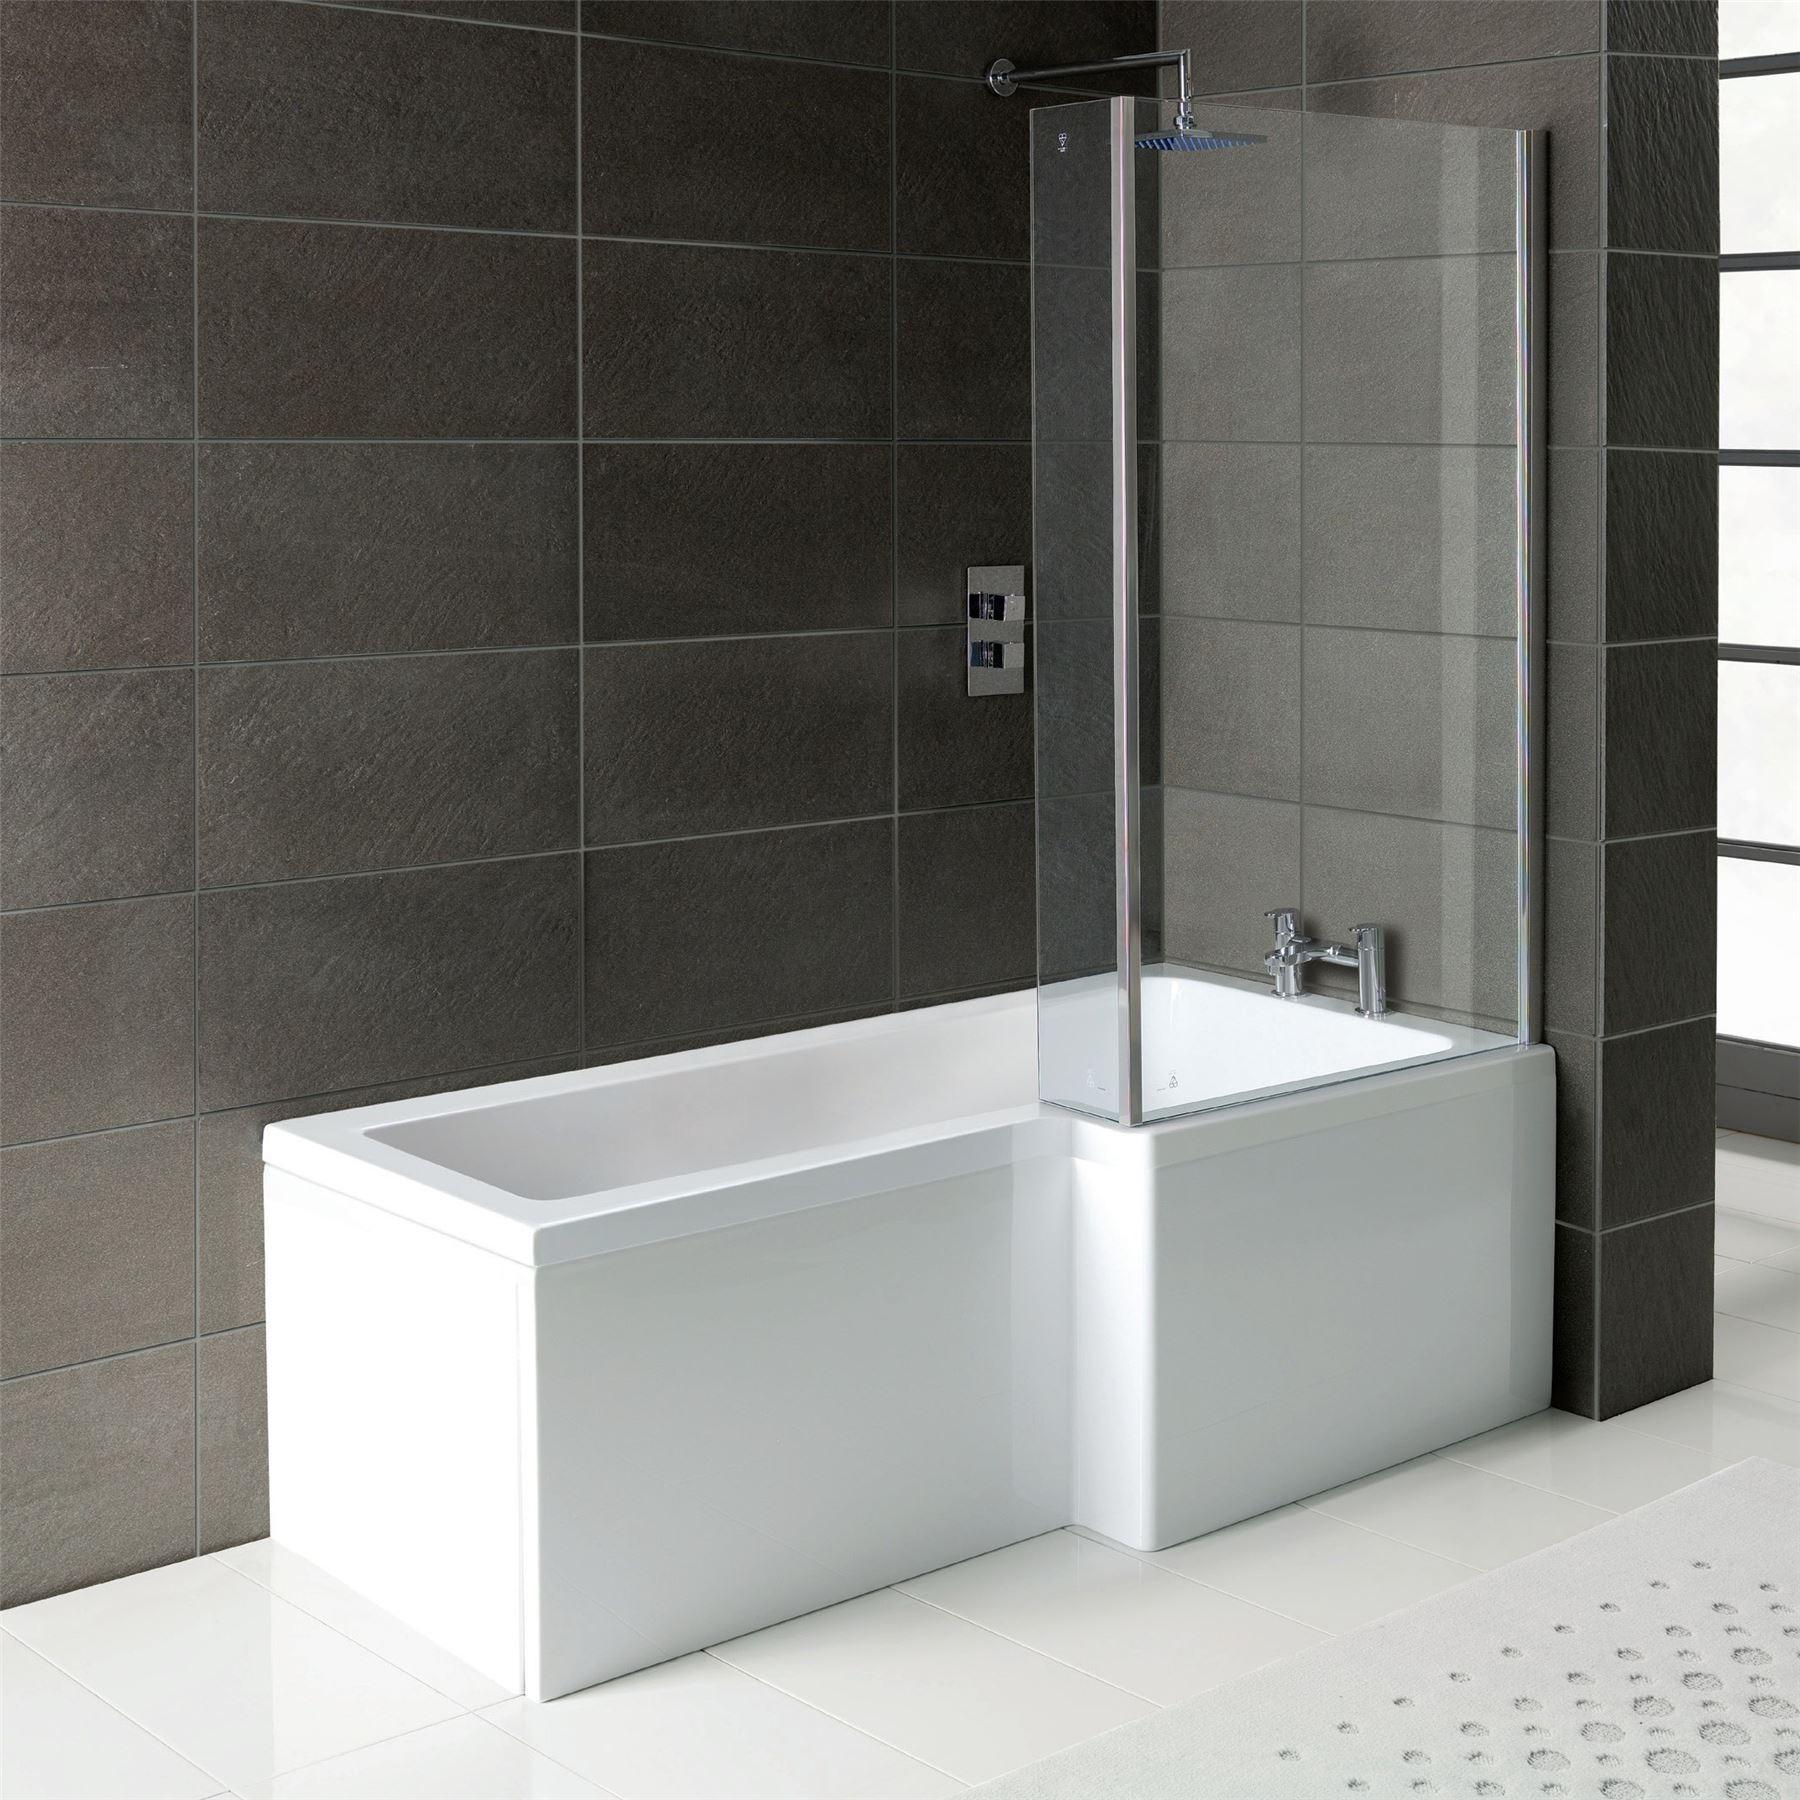 Complete Bathroom Suite L Shape Bath 1700 Shower Screen Square Toilet Sink Ebay